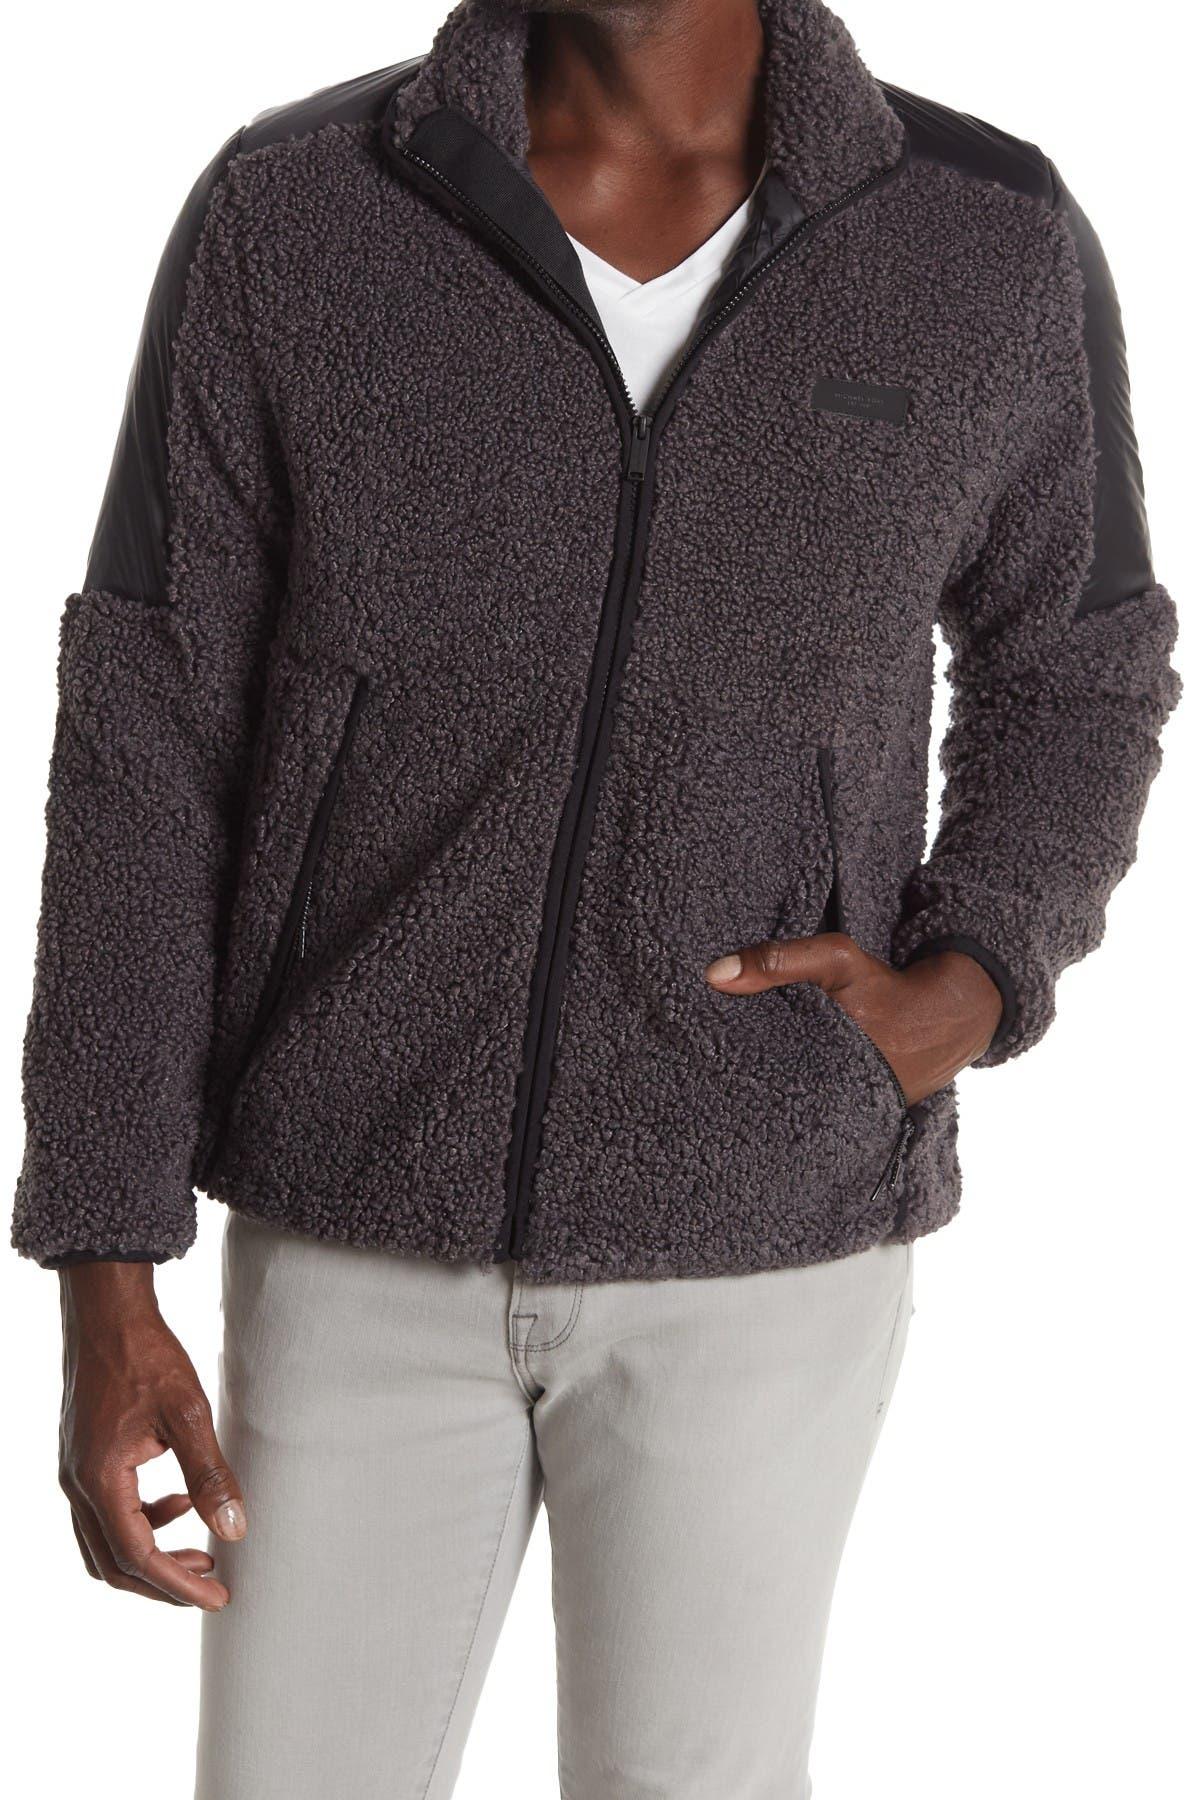 Image of Michael Kors Faux Shearling Fleece Zip Jacket